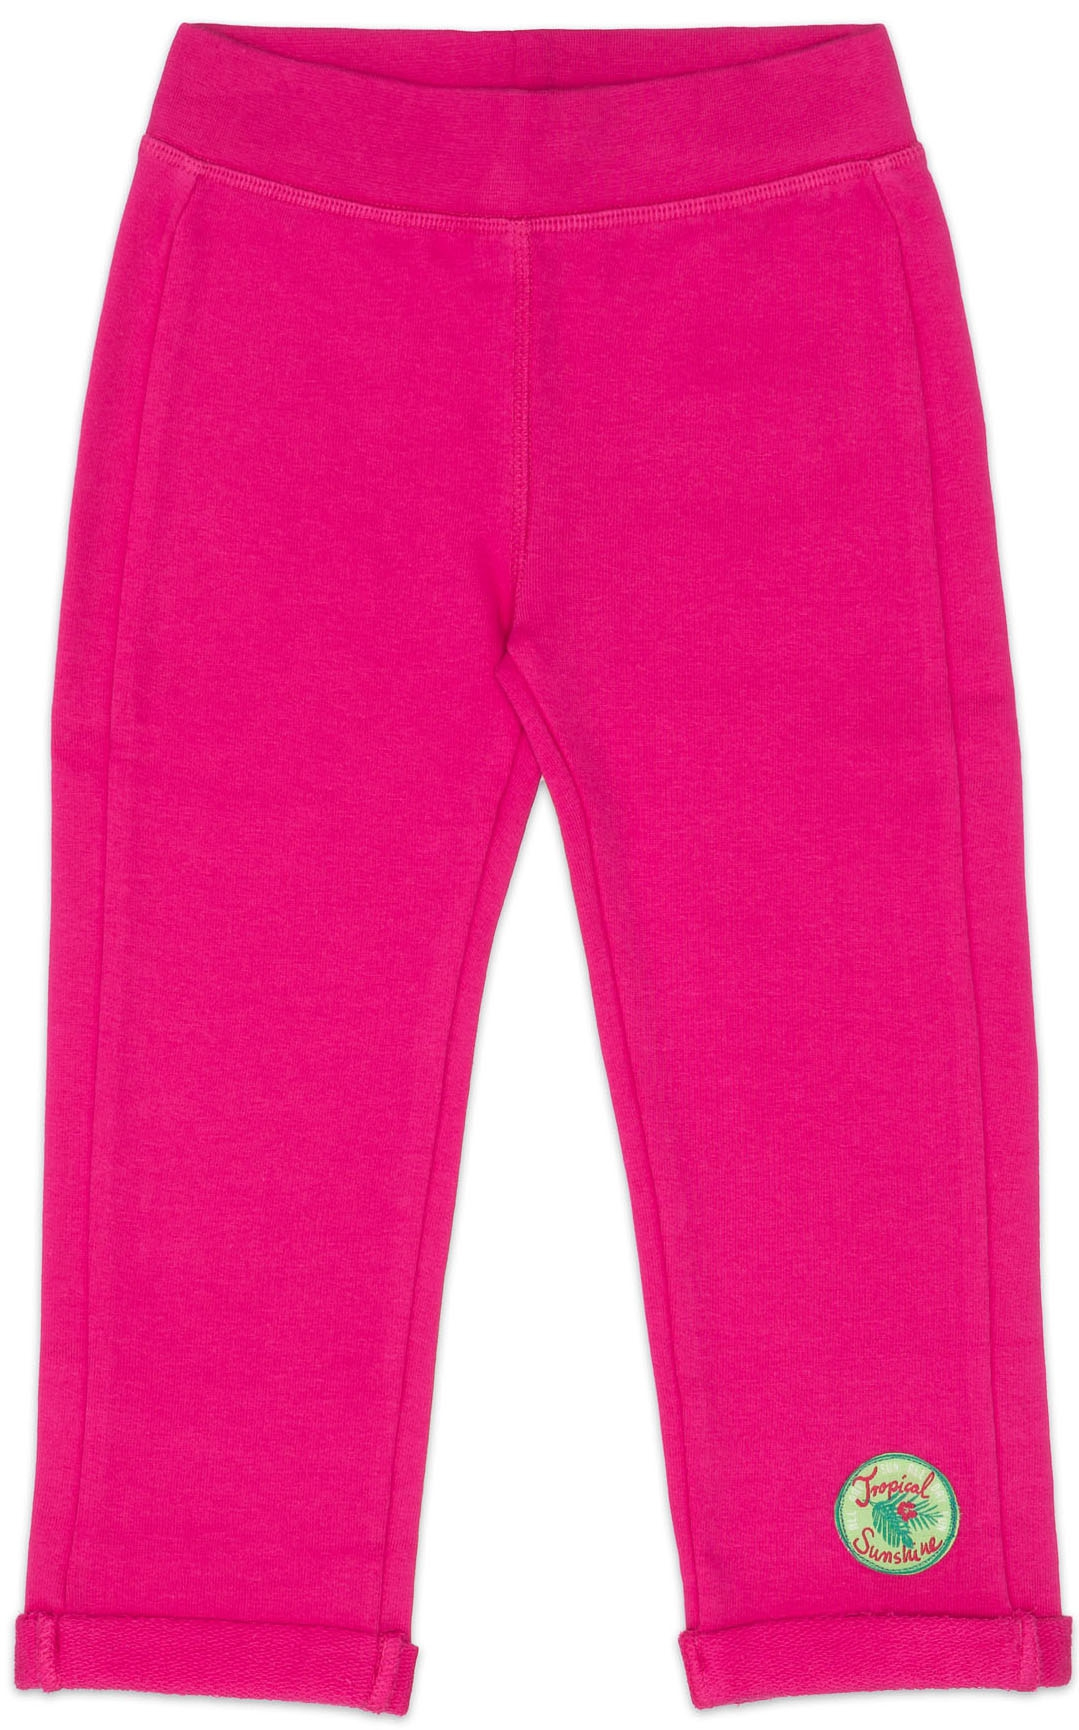 Брюки Barkito Брюки трикотажные для девочки Barkito, Алоха Гавайи!, темно-розовые брюки barkito салатовая